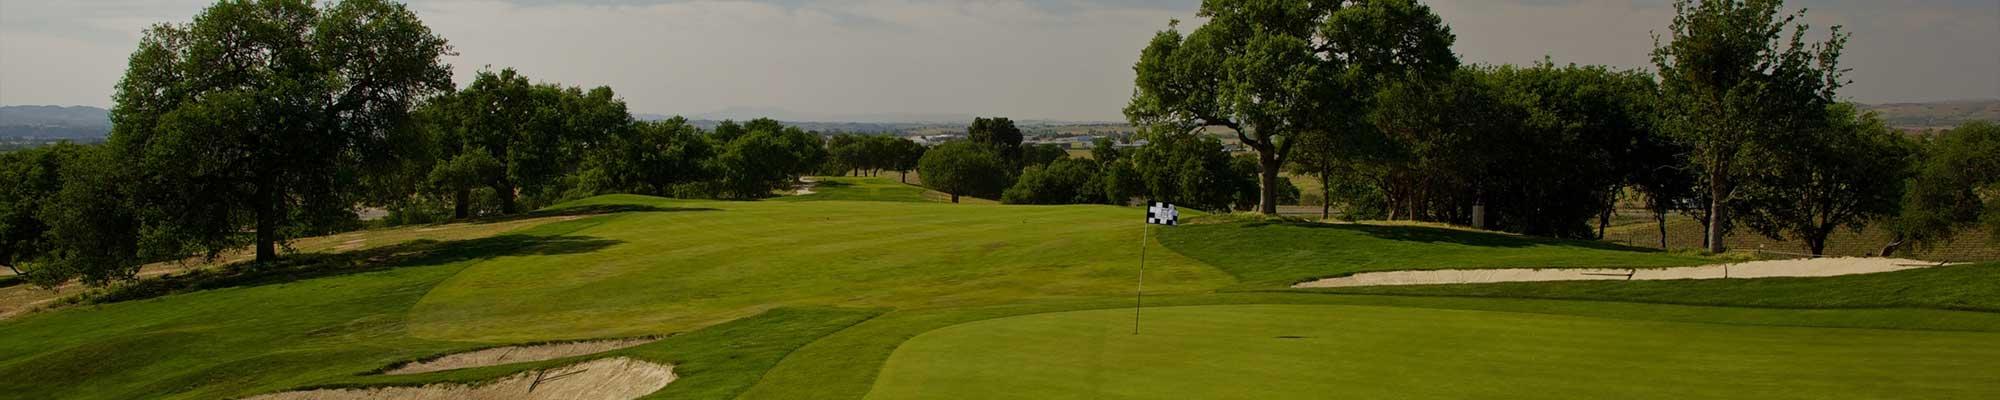 golf course in paso robles ca public golf course near san luis